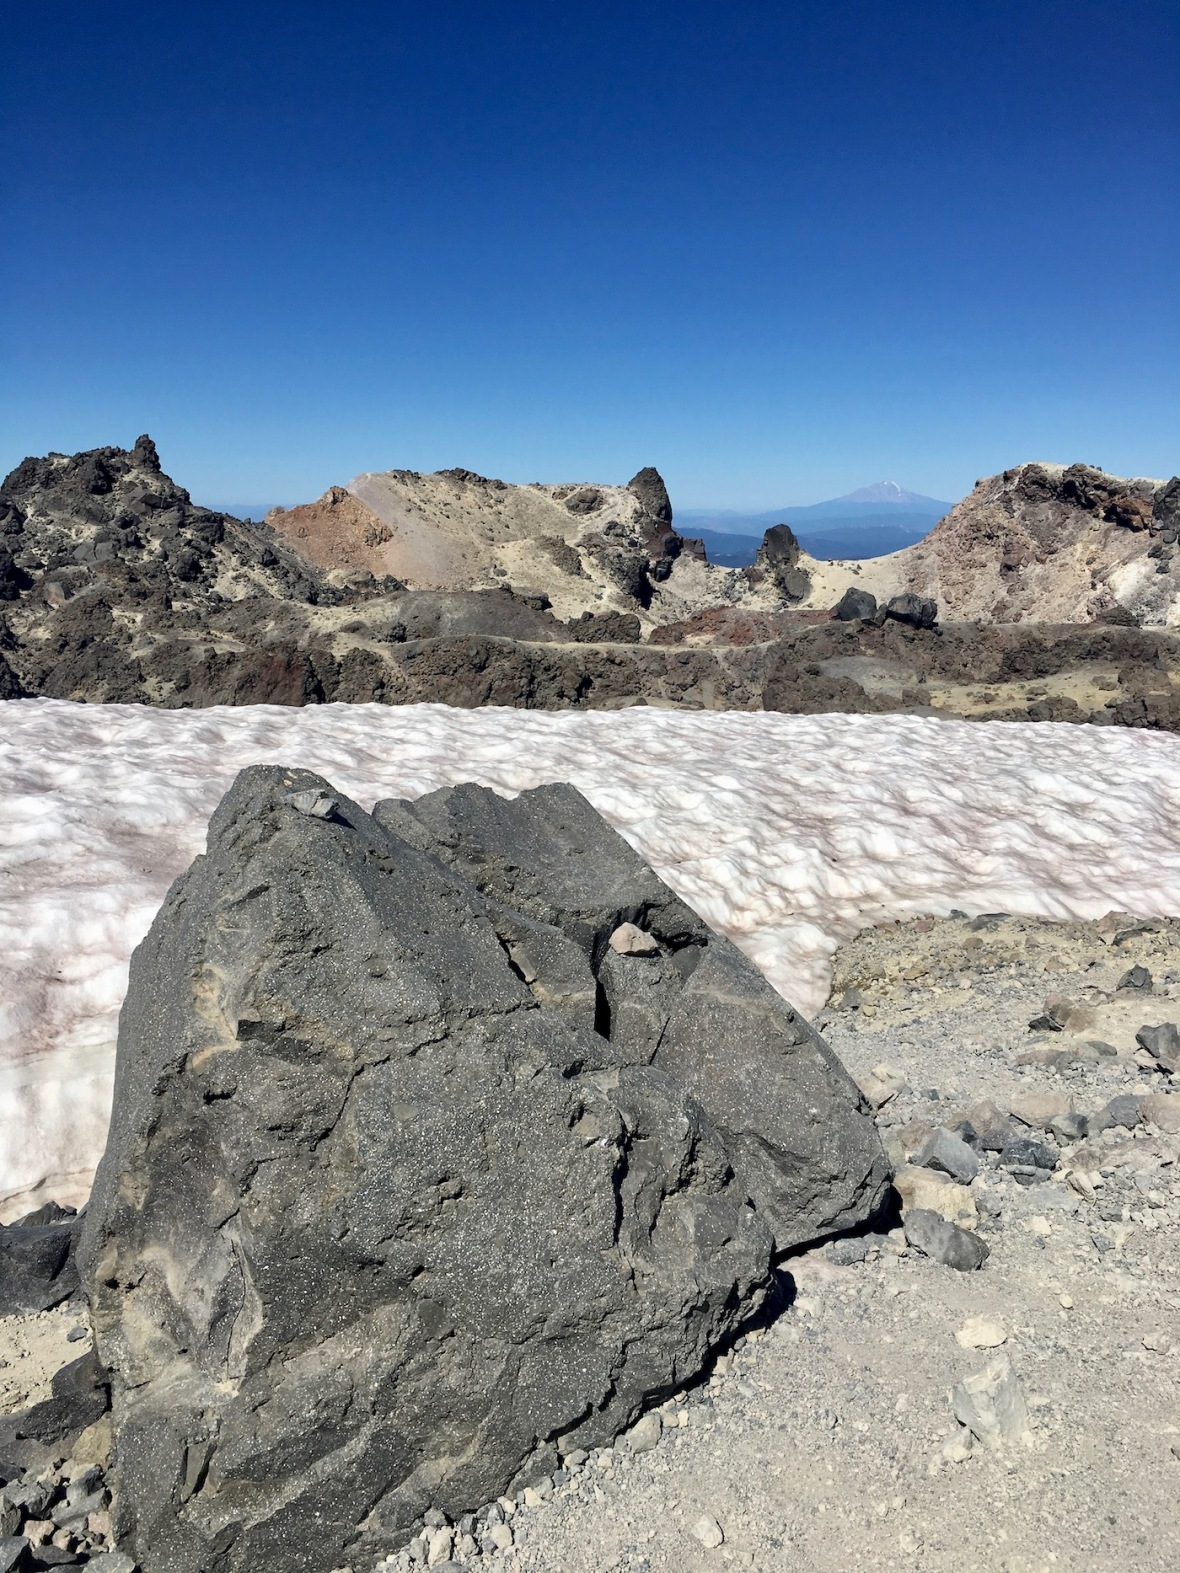 Volcanic boulder, permanent snowfield, caldera rim in Lassen Volcanic National Park